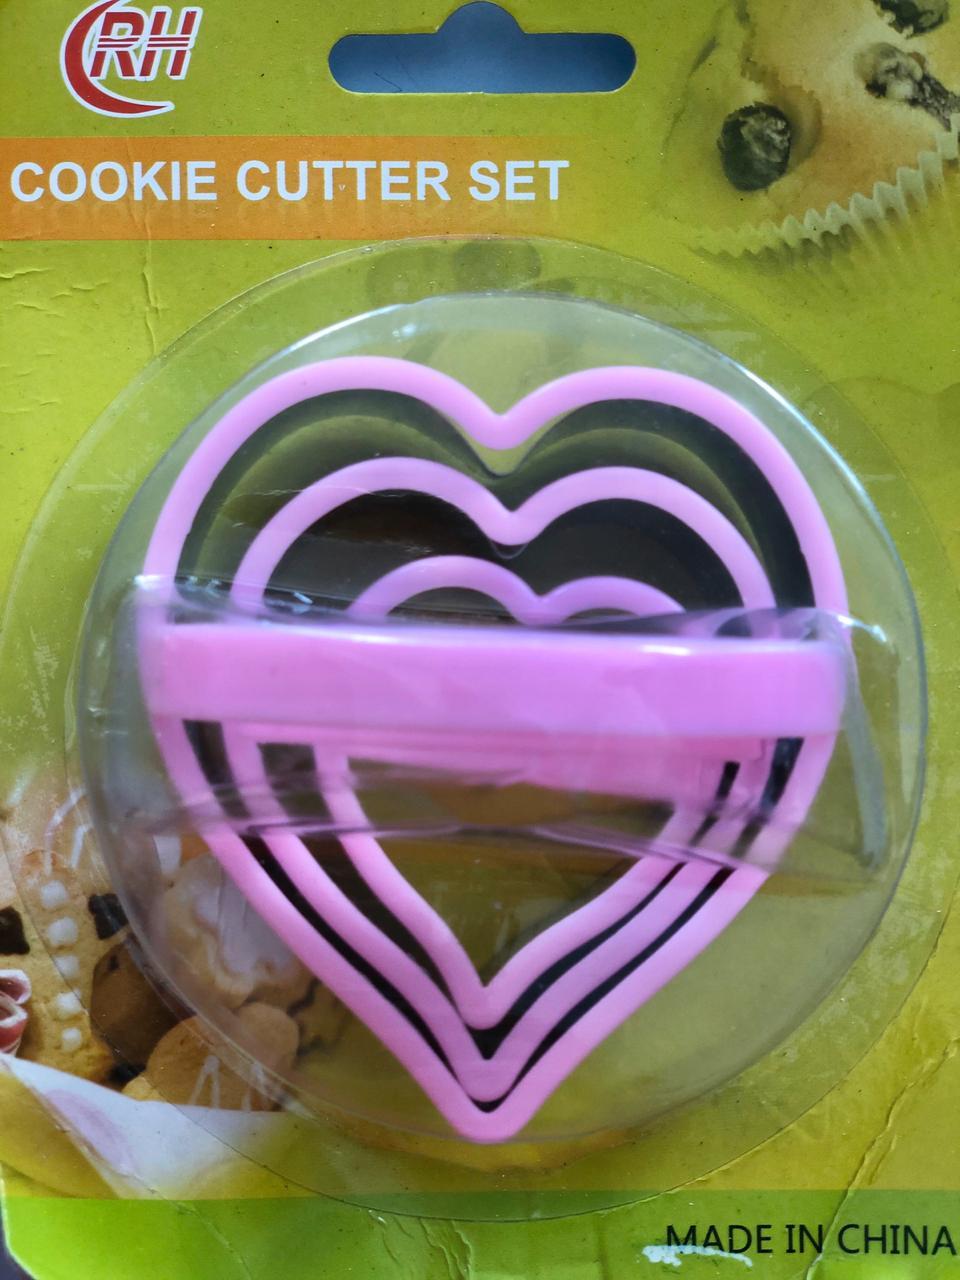 Cookie Cutter Set